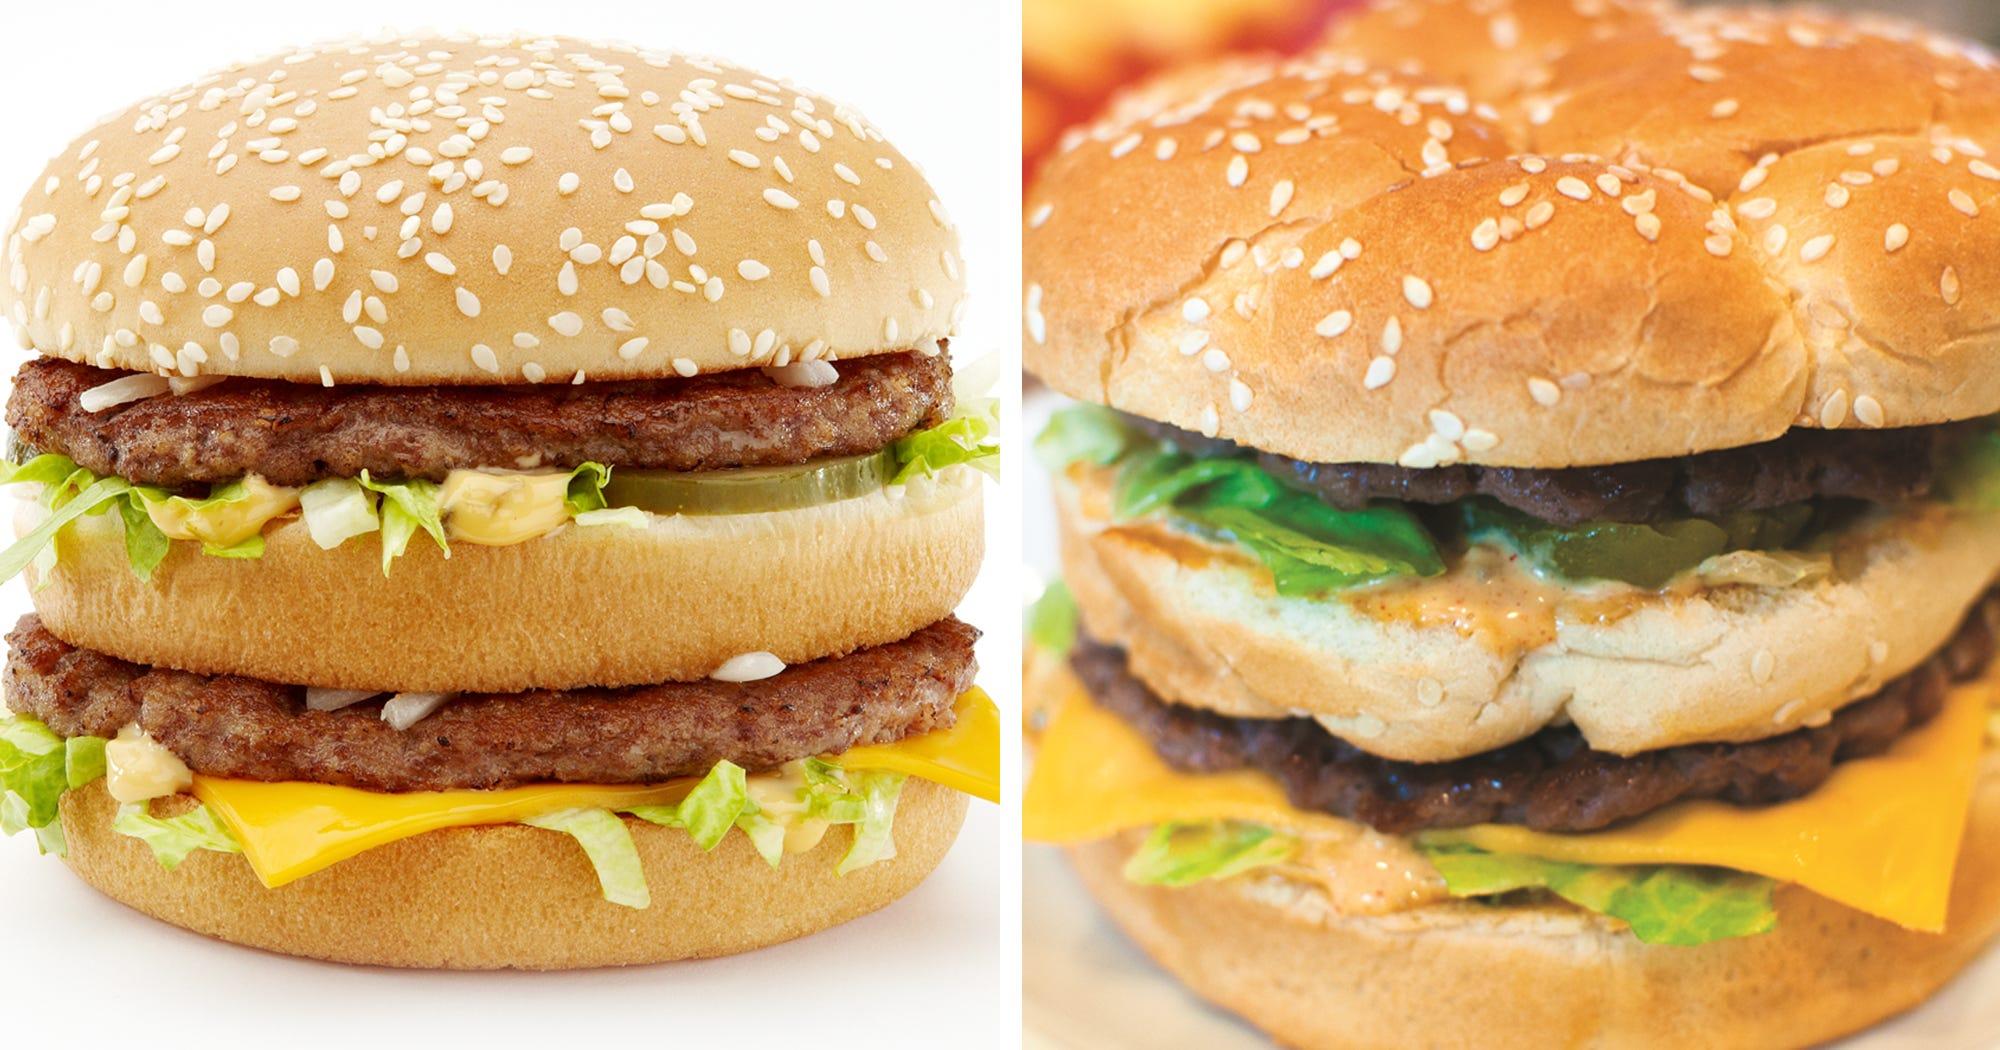 7 Genius Food Hacks To Cook Your Favorite Fast Food At Home